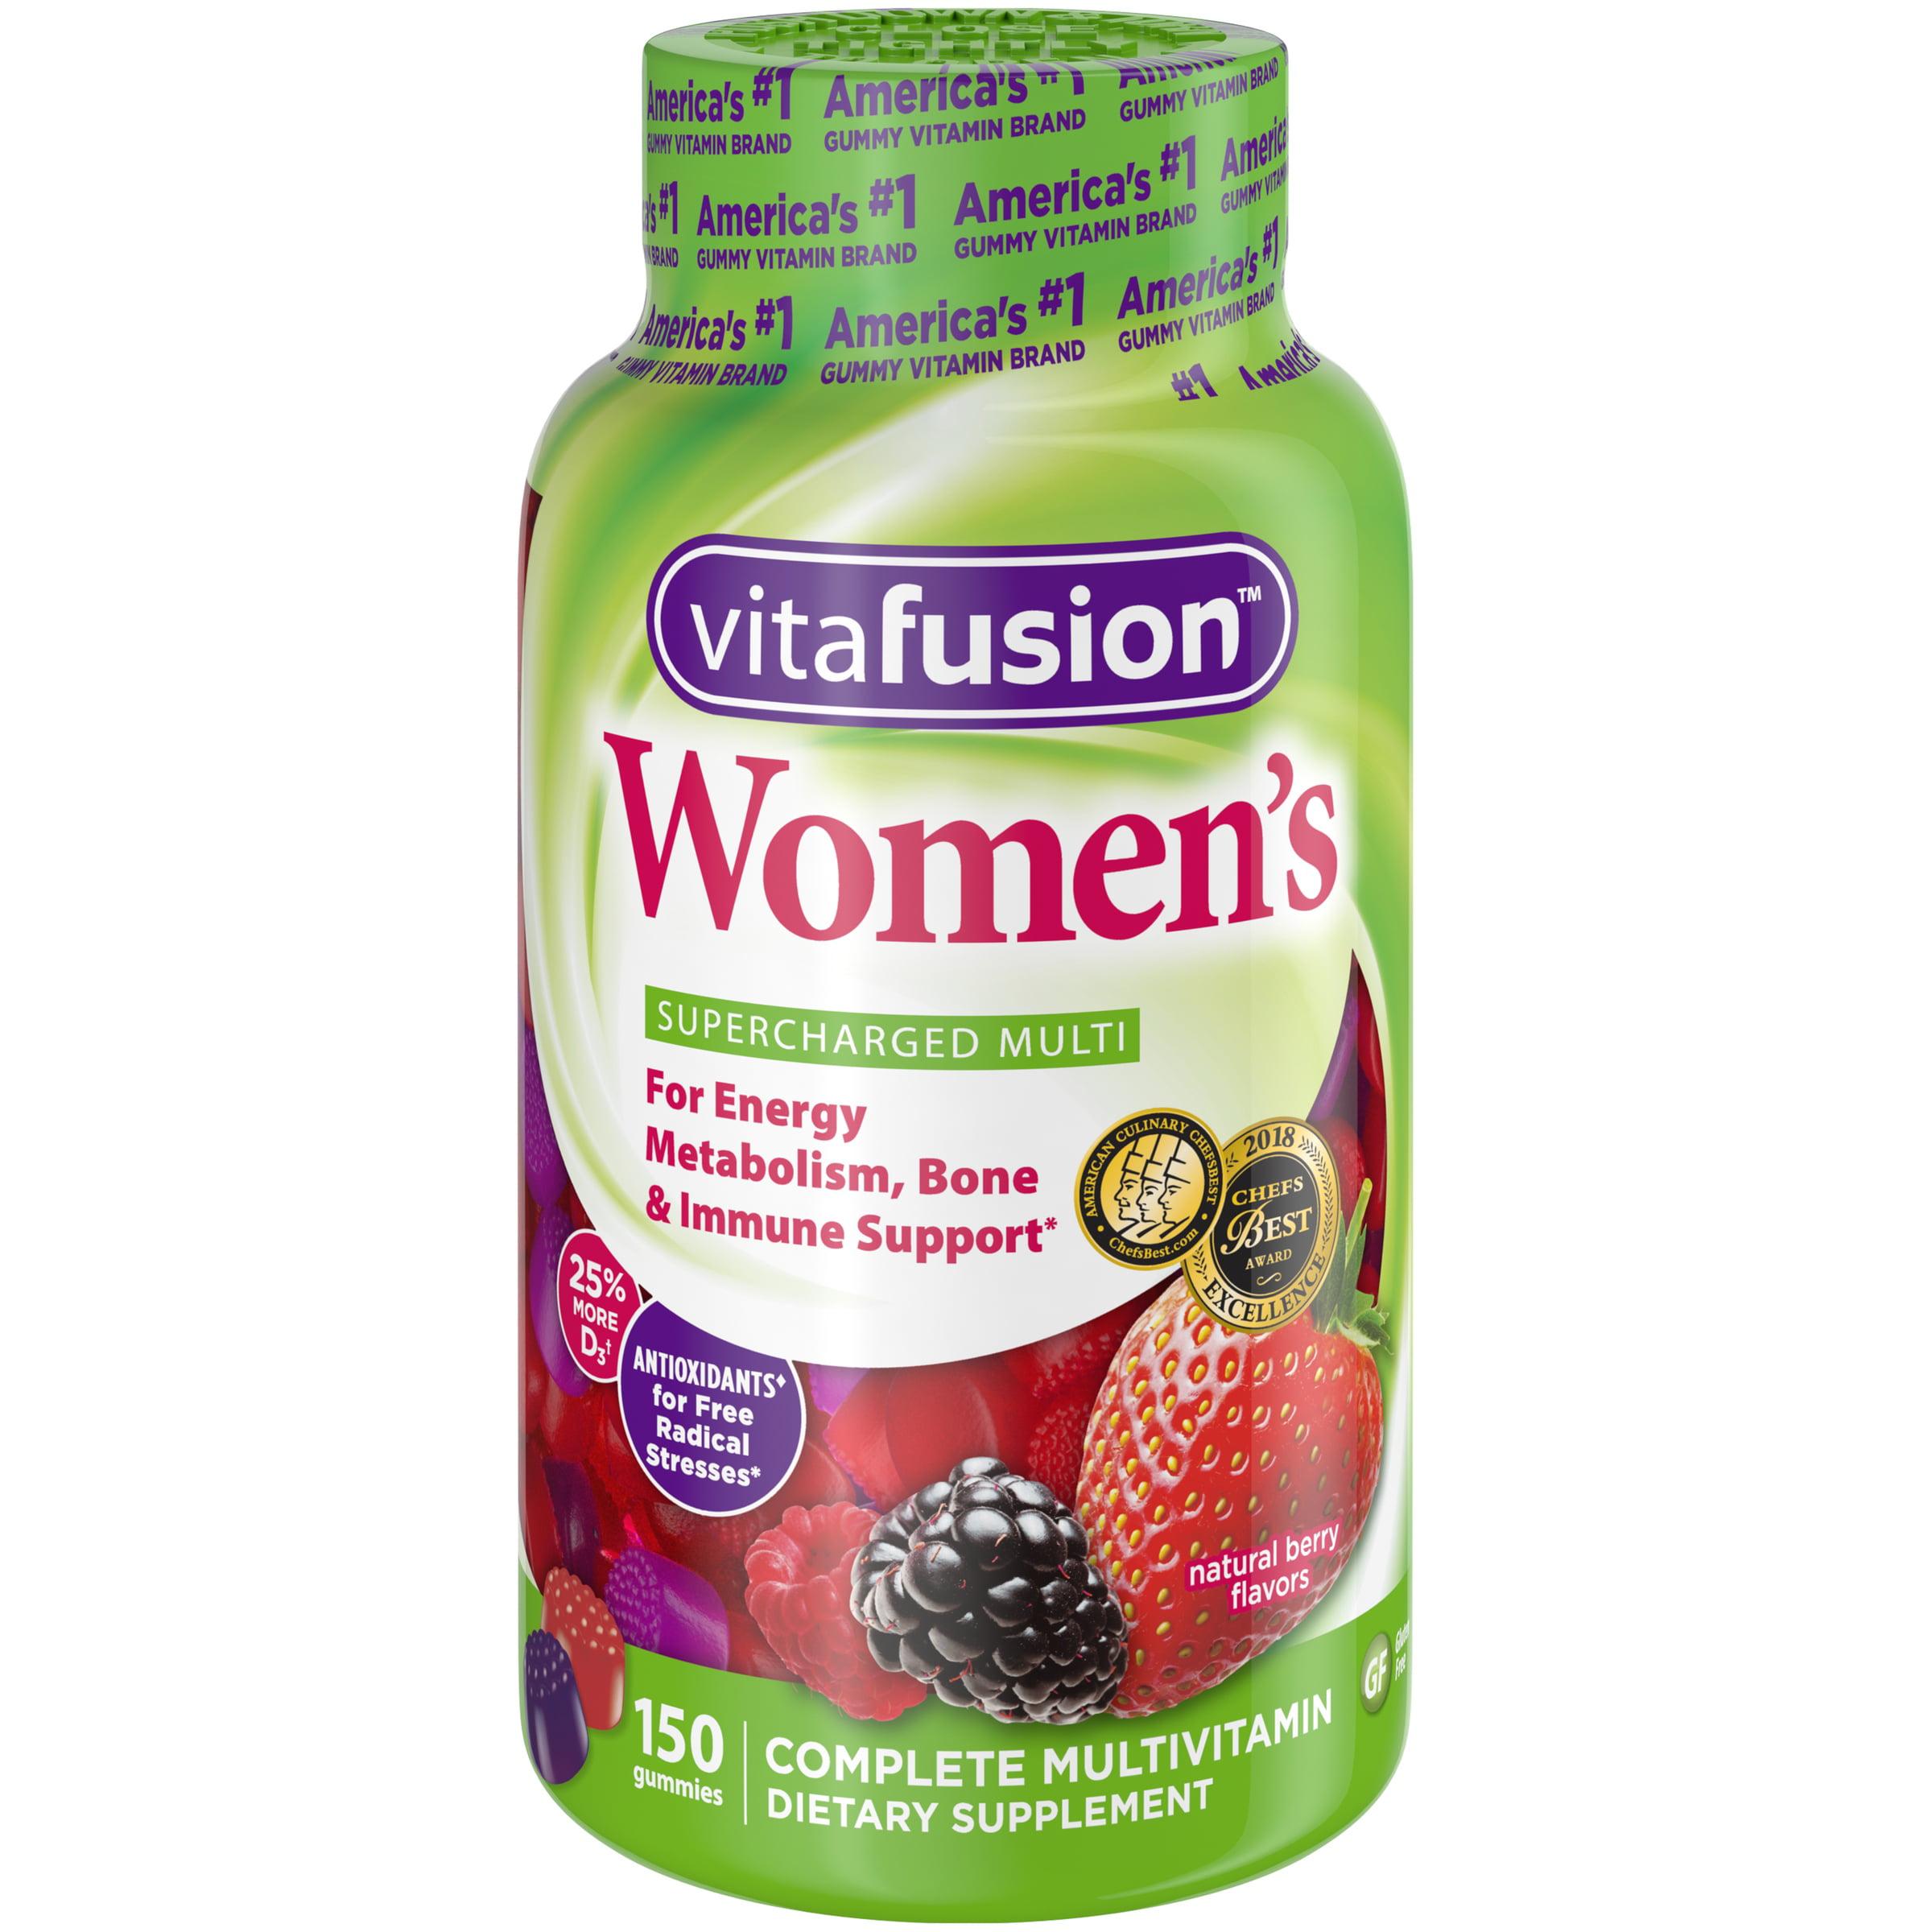 Vitafusion Adult Women's Multivitamin Gummies, Berry, 150 Ct